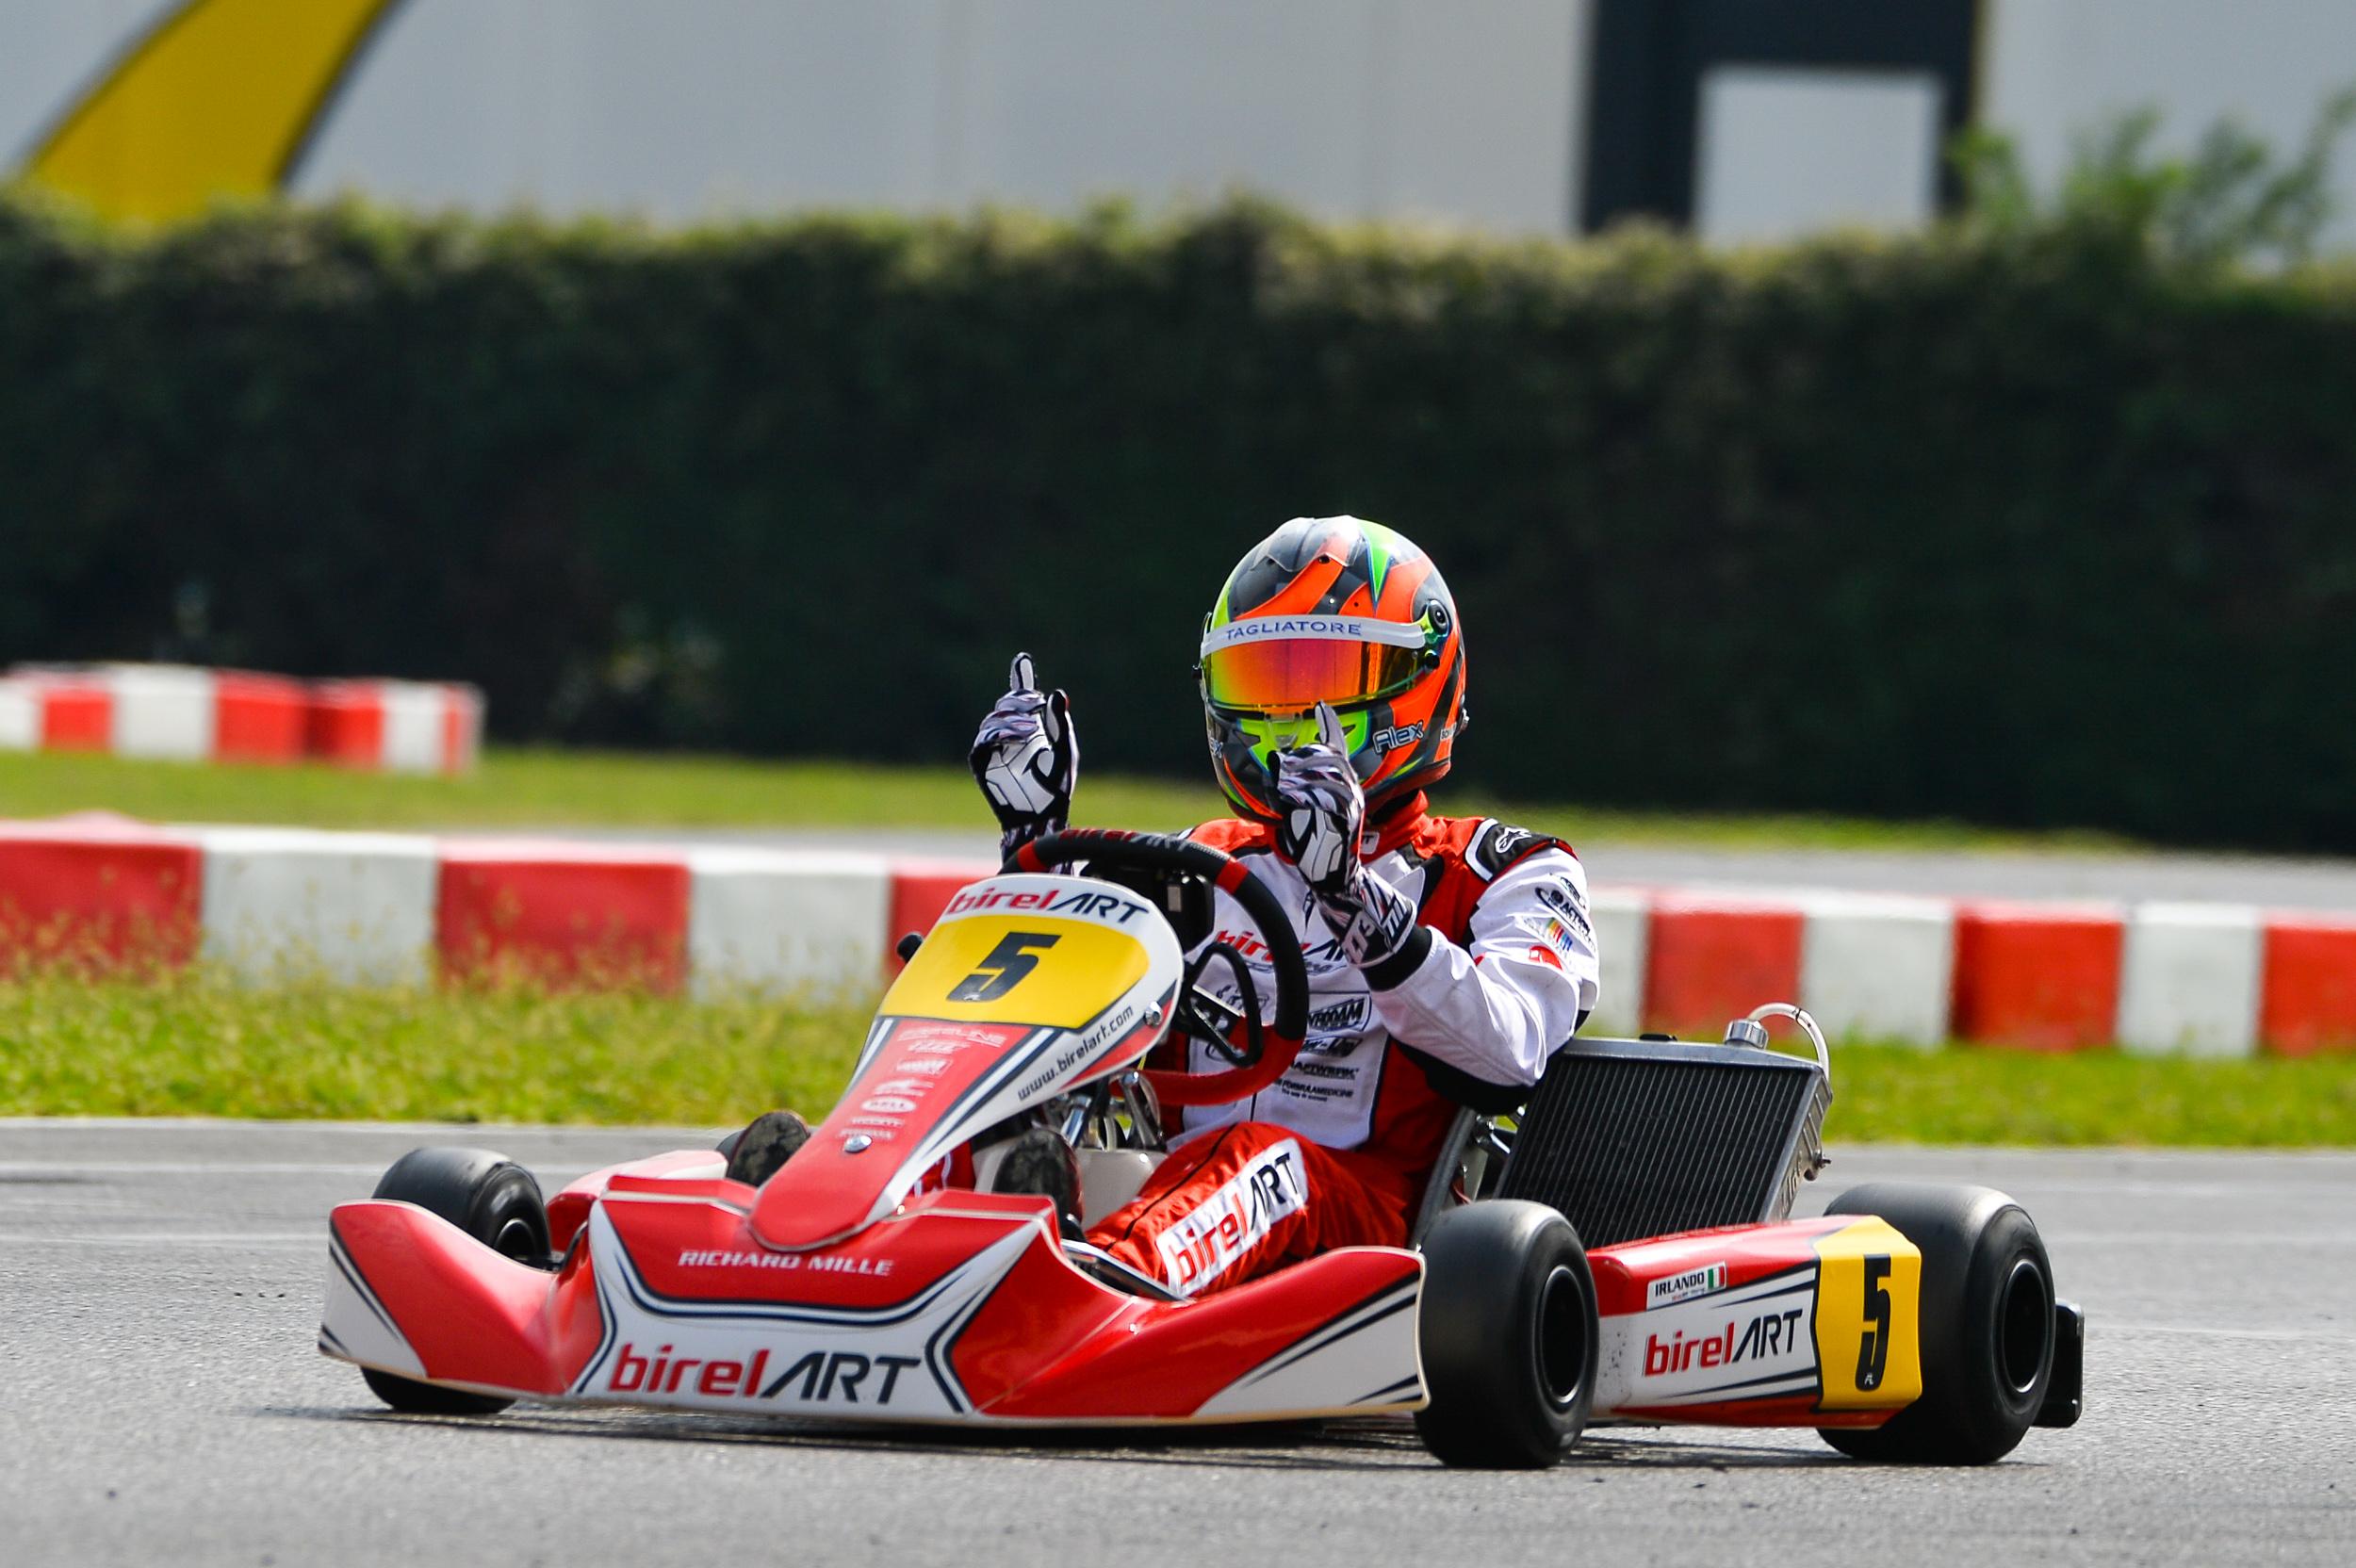 Alex Irlando wins in the Euro Series WSK weekend